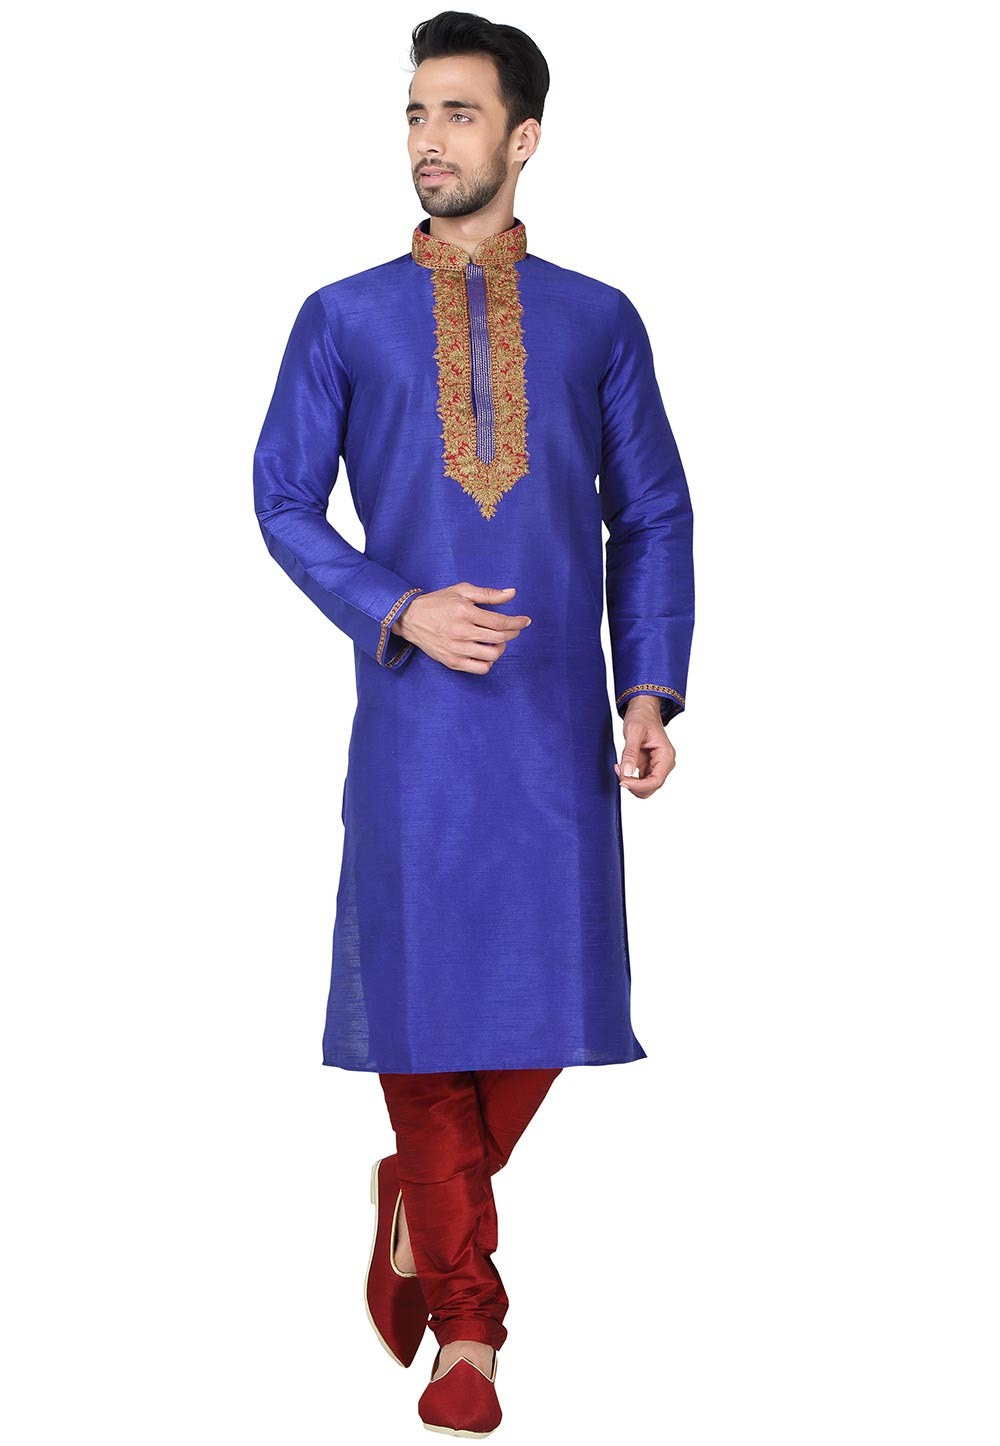 Blue Color Art Silk Designer Kurta Pajama With Embroidery Work.